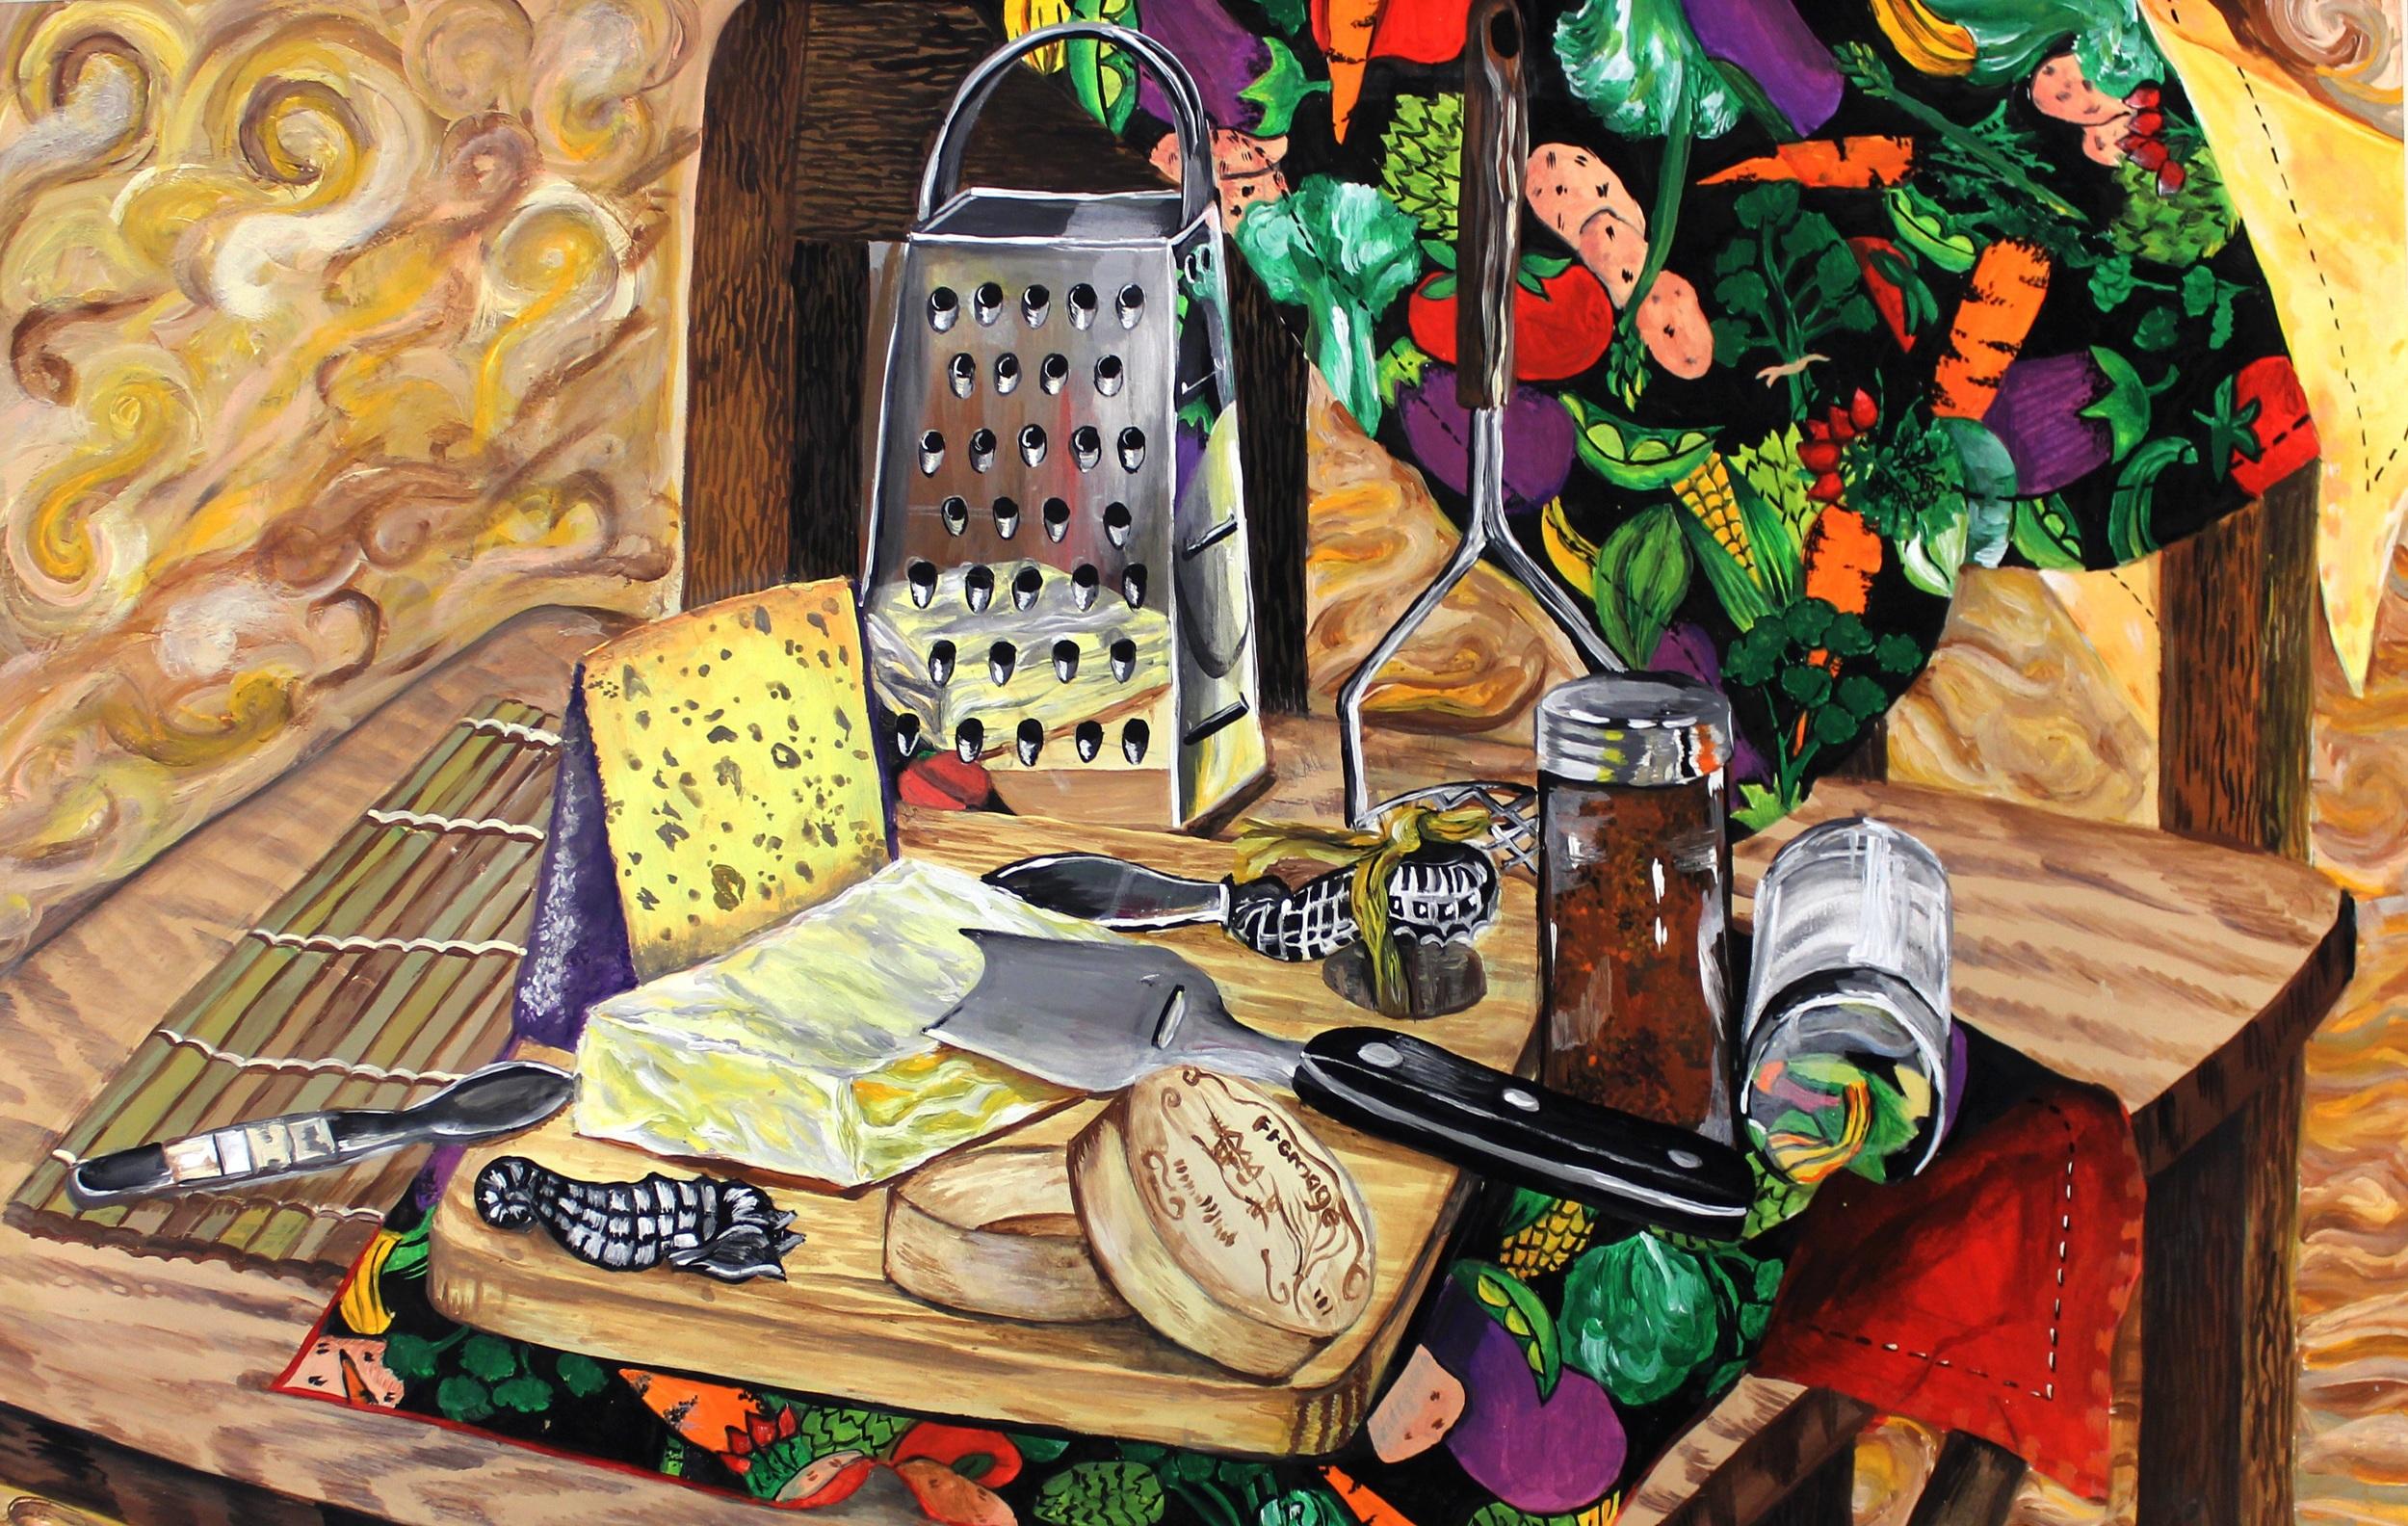 Cheese Still Life.jpg Dasha Bobrova Arrylic Paint 13- x 21-.jpg